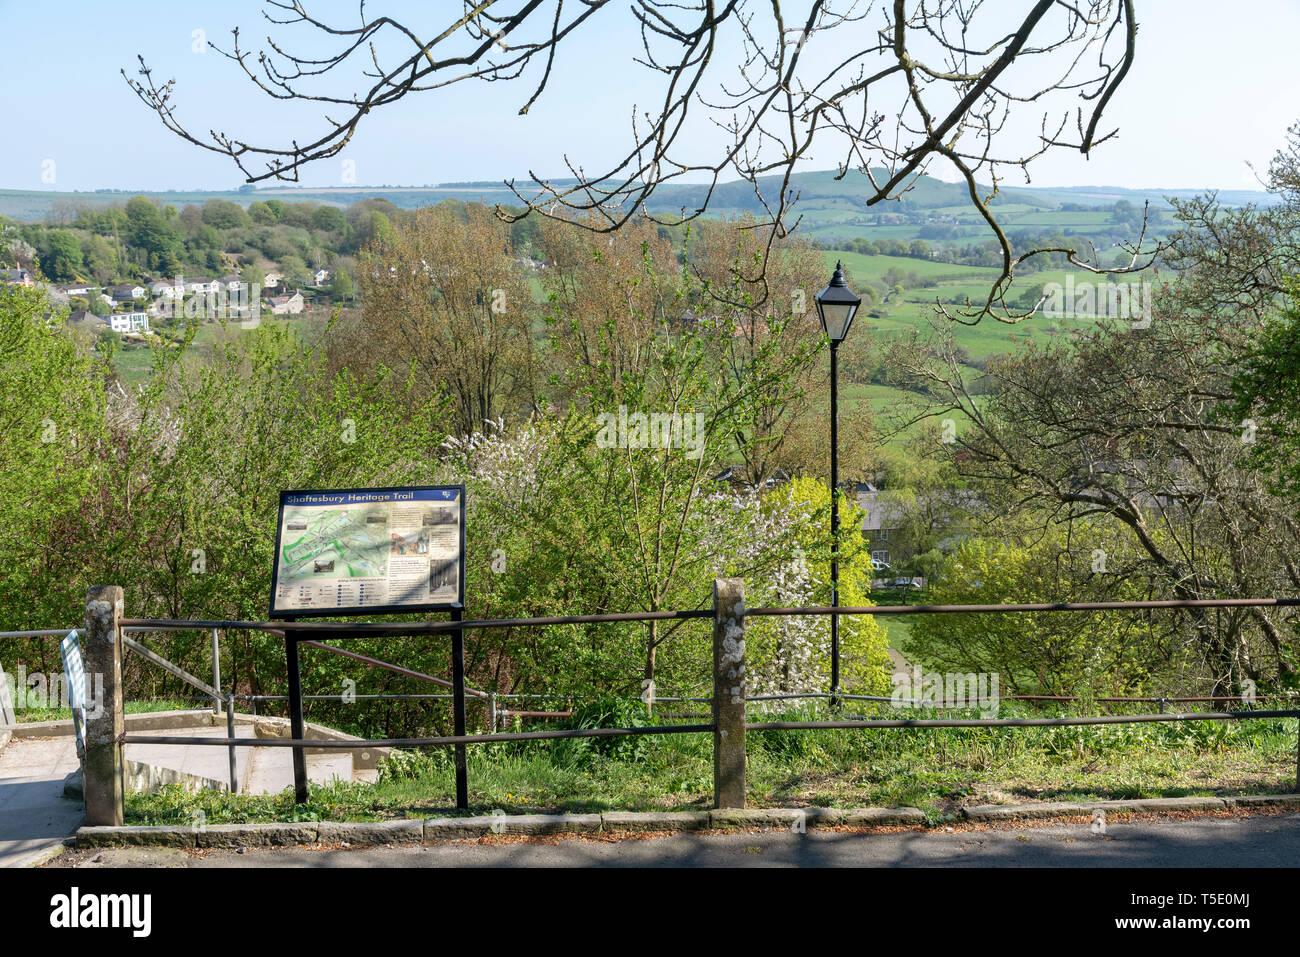 Shaftesbury, Dorset, England, UK. April 2019. The Shaftesbury Heritage Trail. - Stock Image